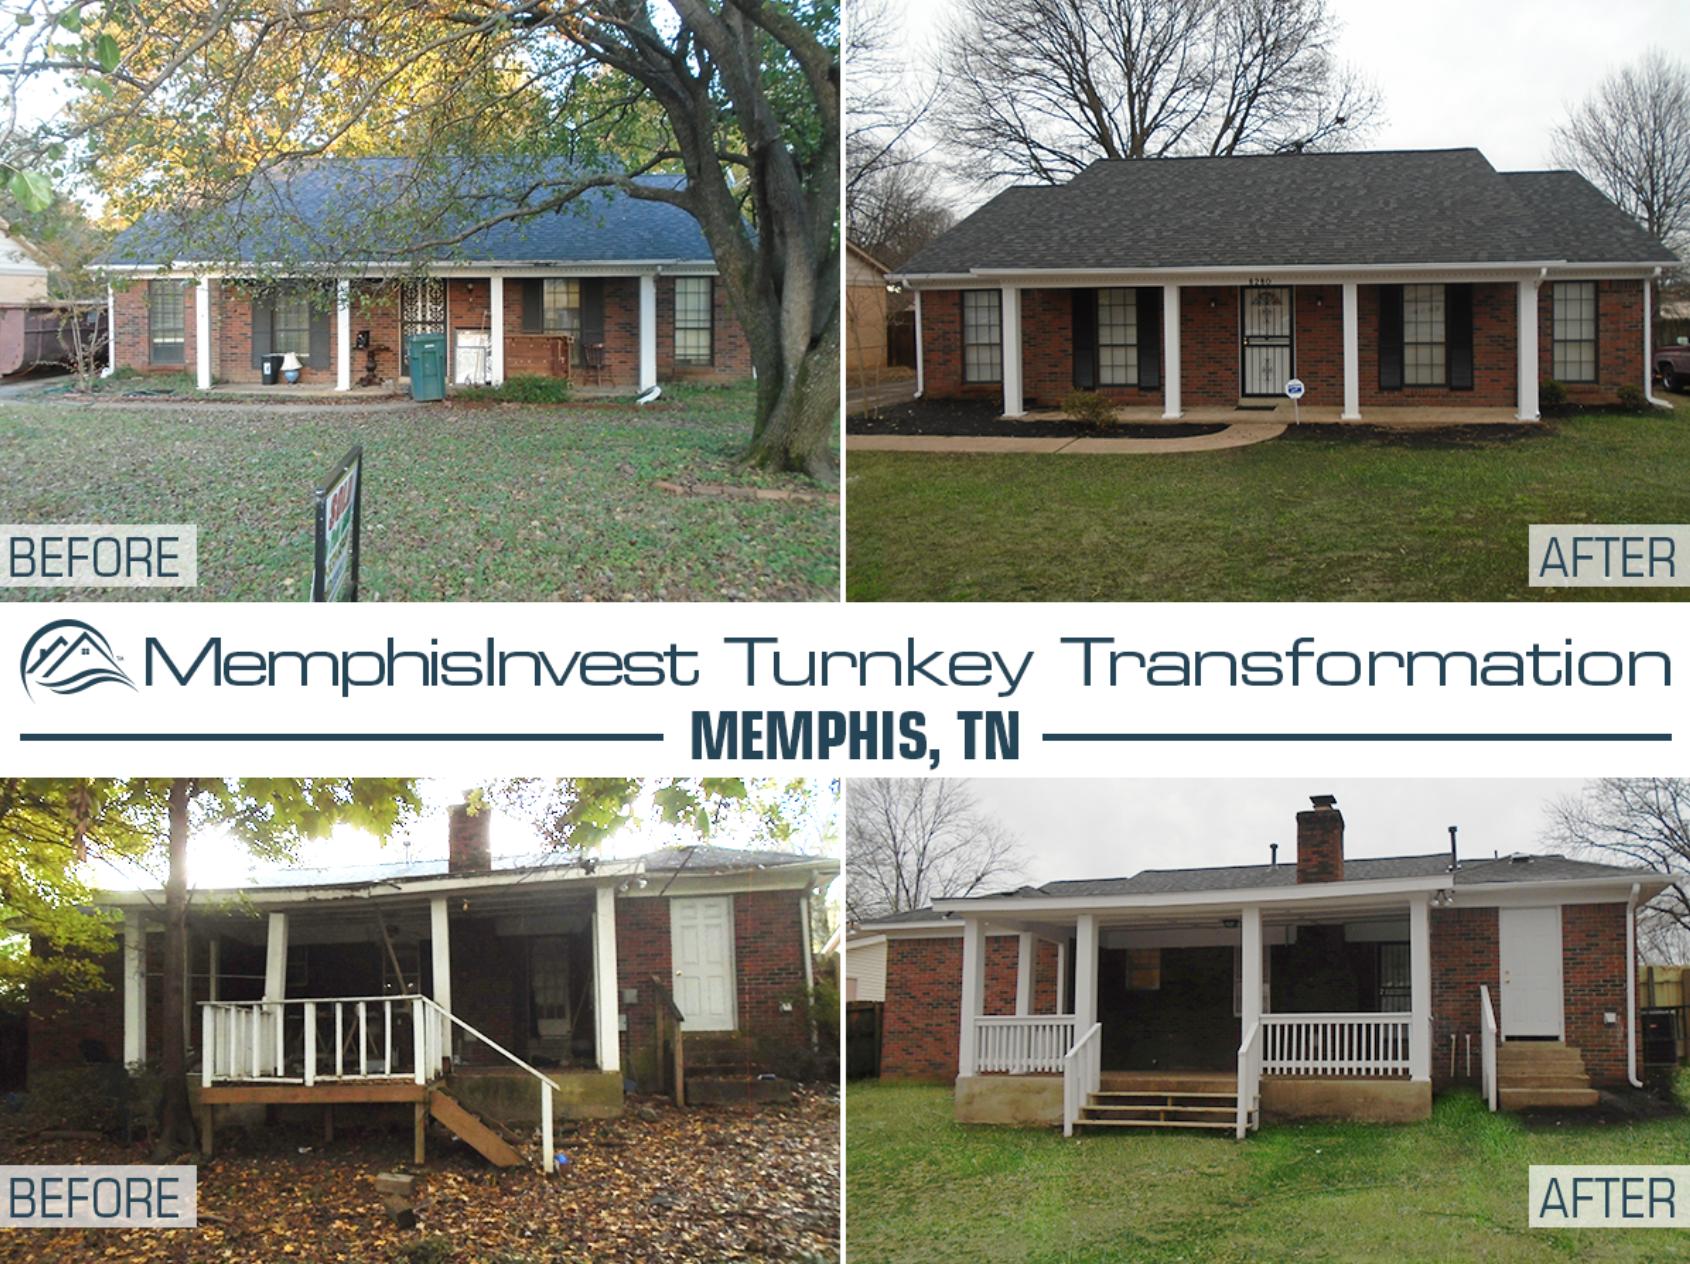 Memphis_Turnkey_Renovation